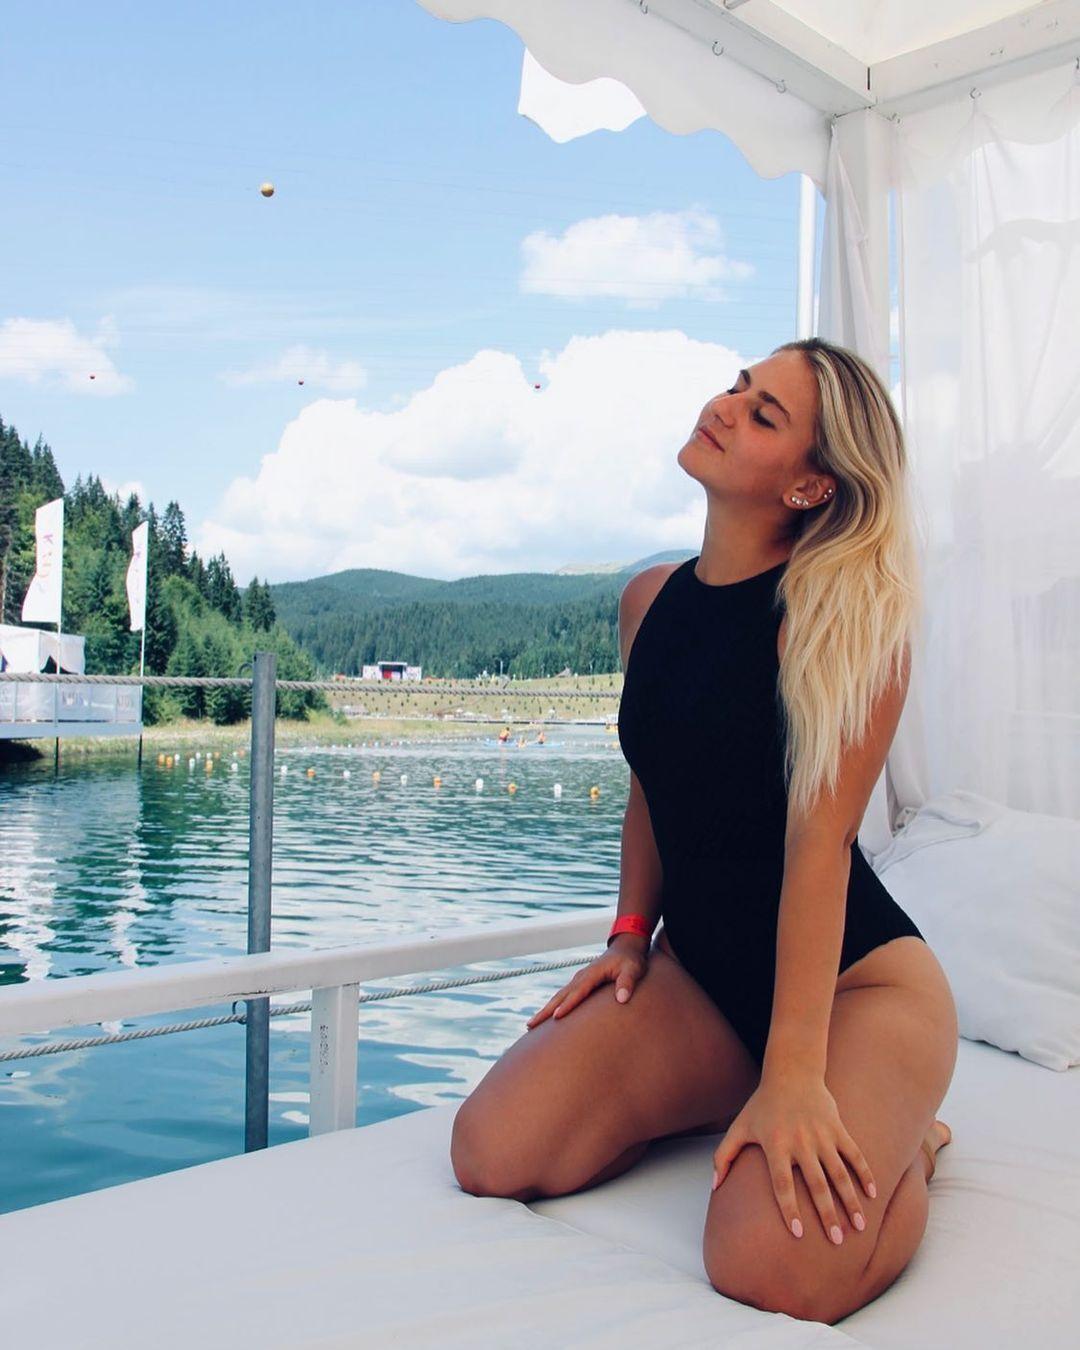 Марта Костюк в купальнике.